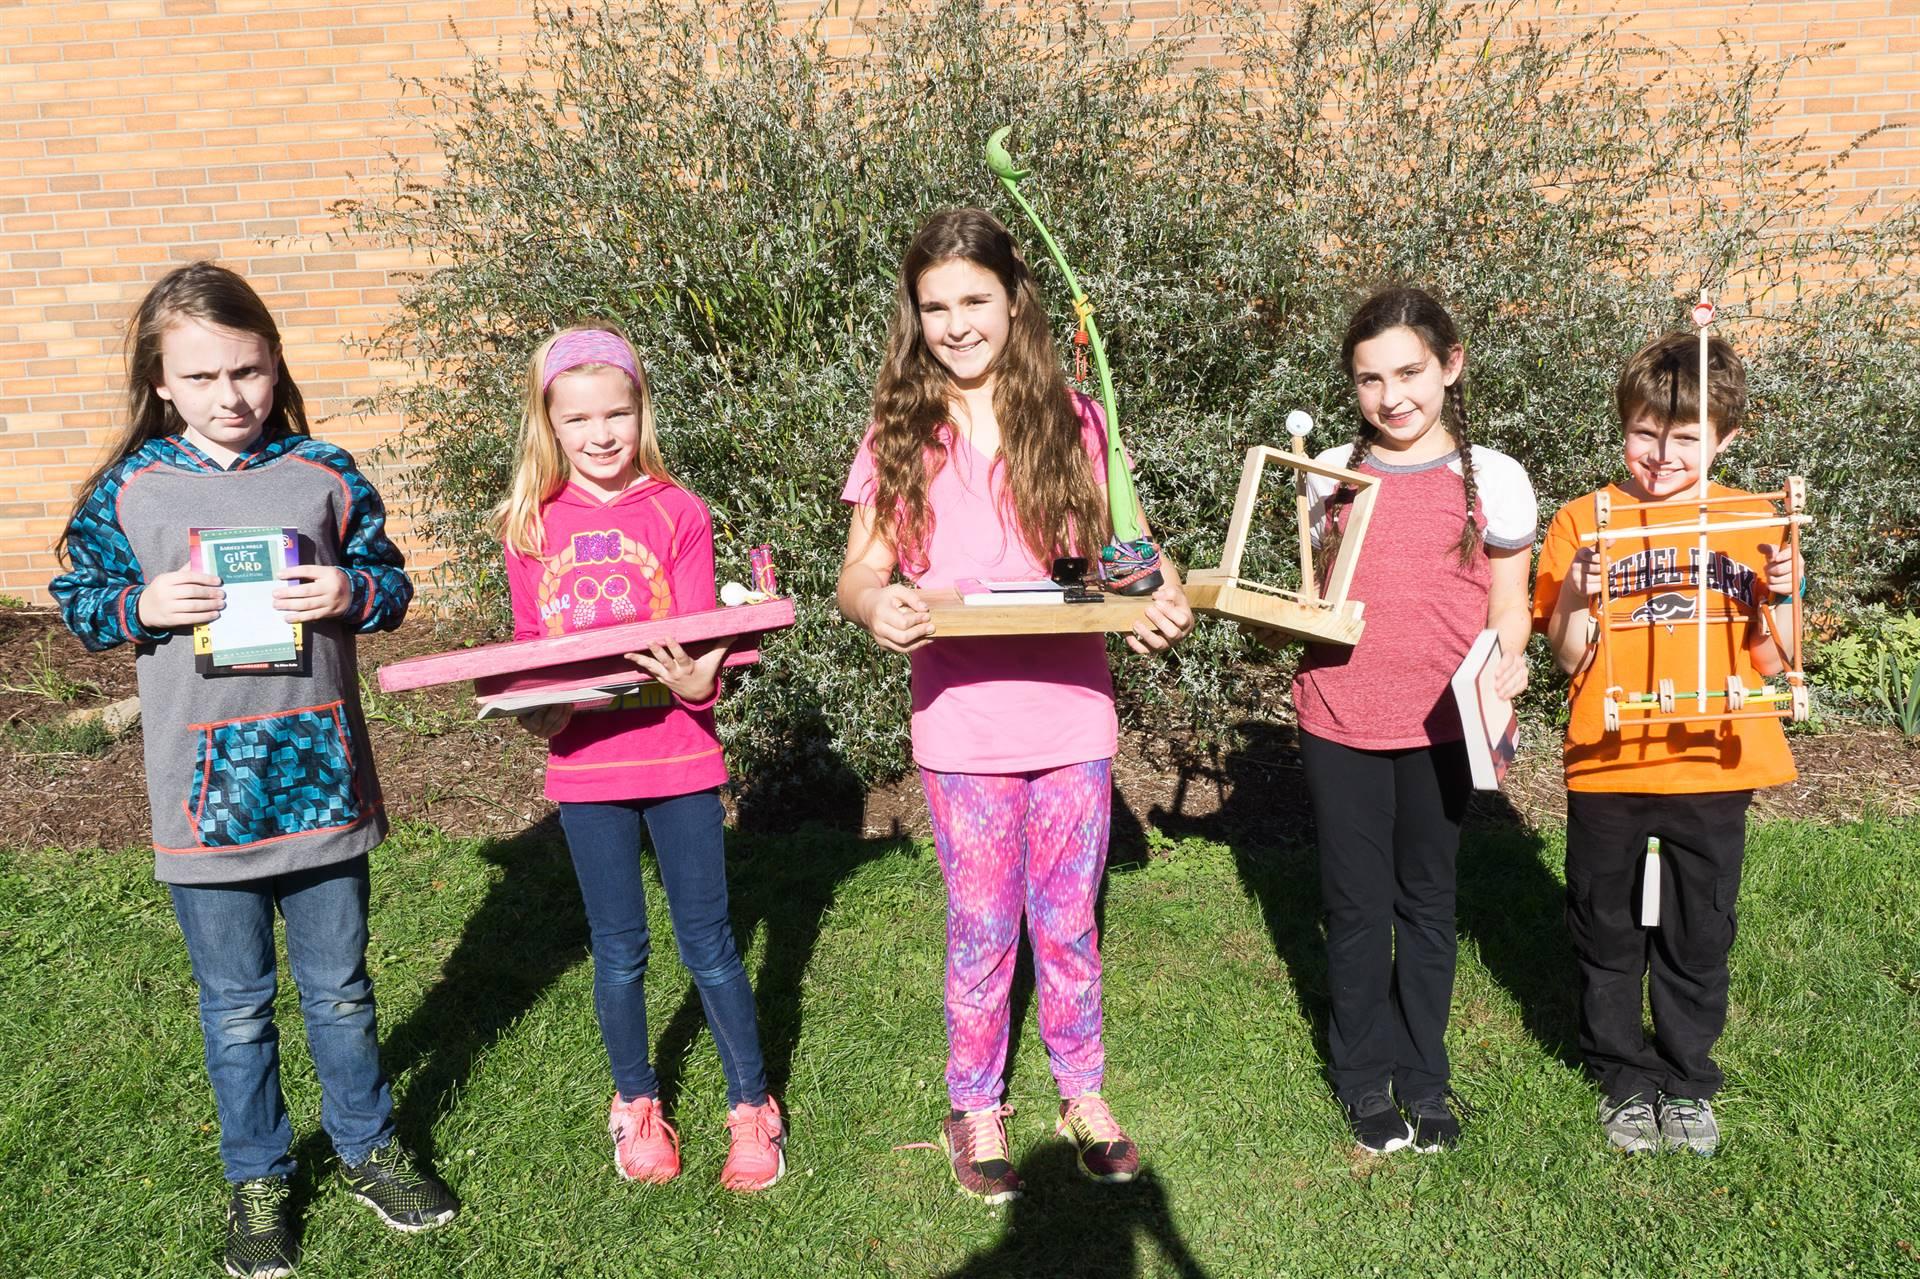 The Pumpkin Chunkin winners